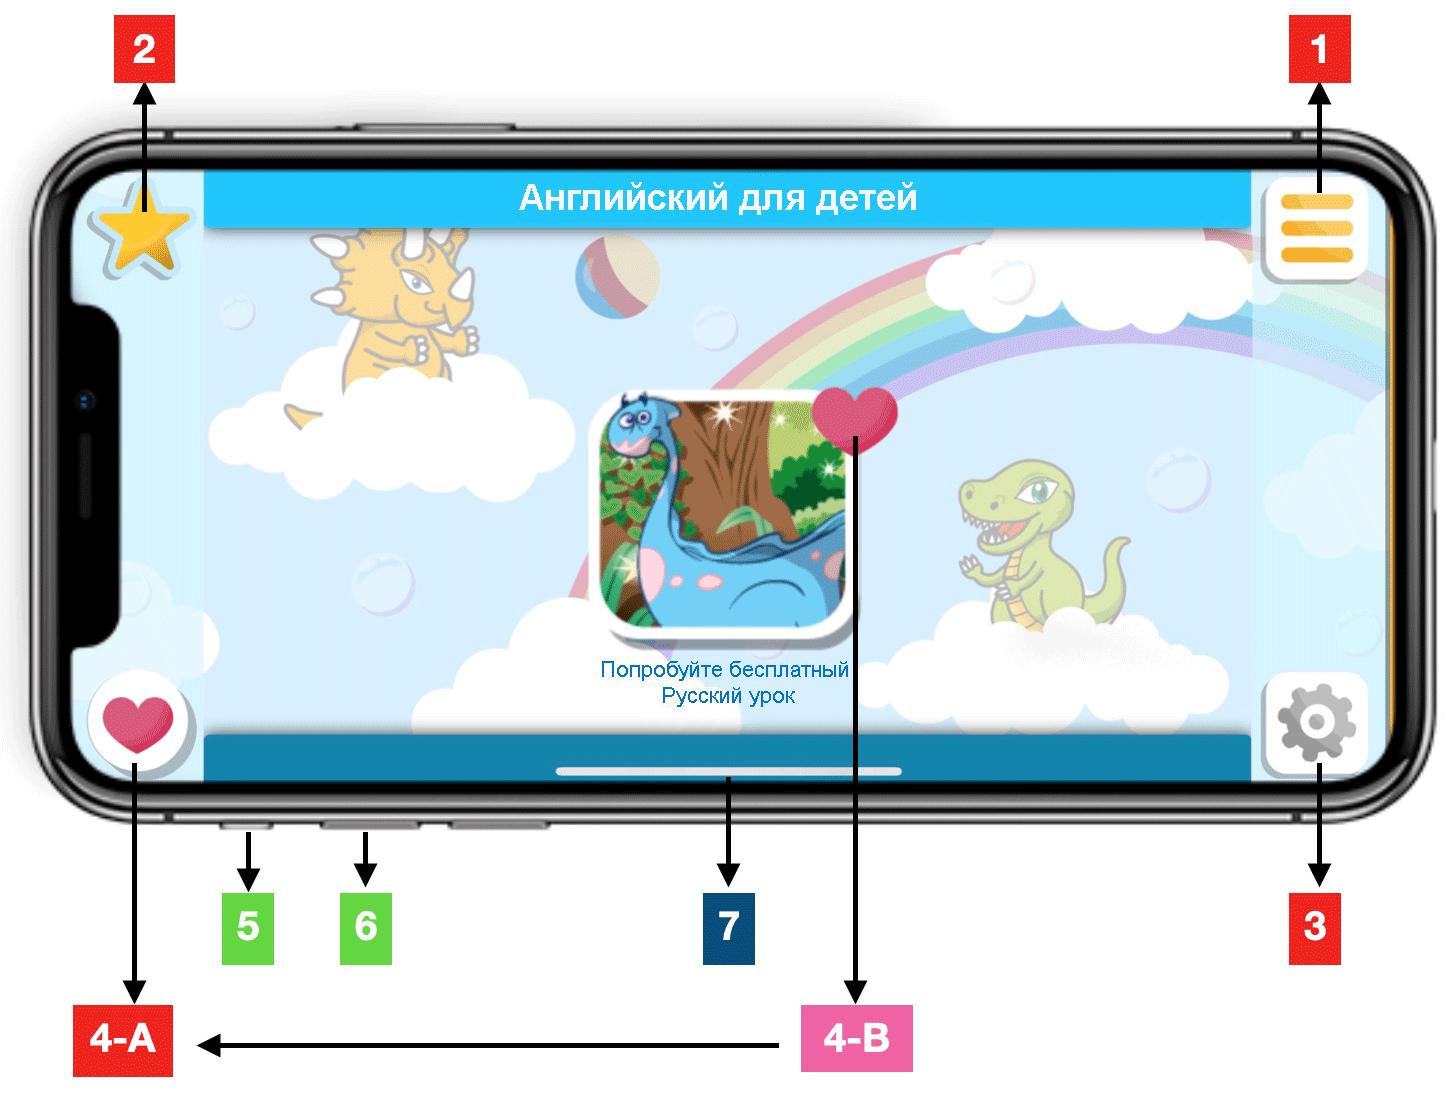 dinolingo-app-instructions-ru